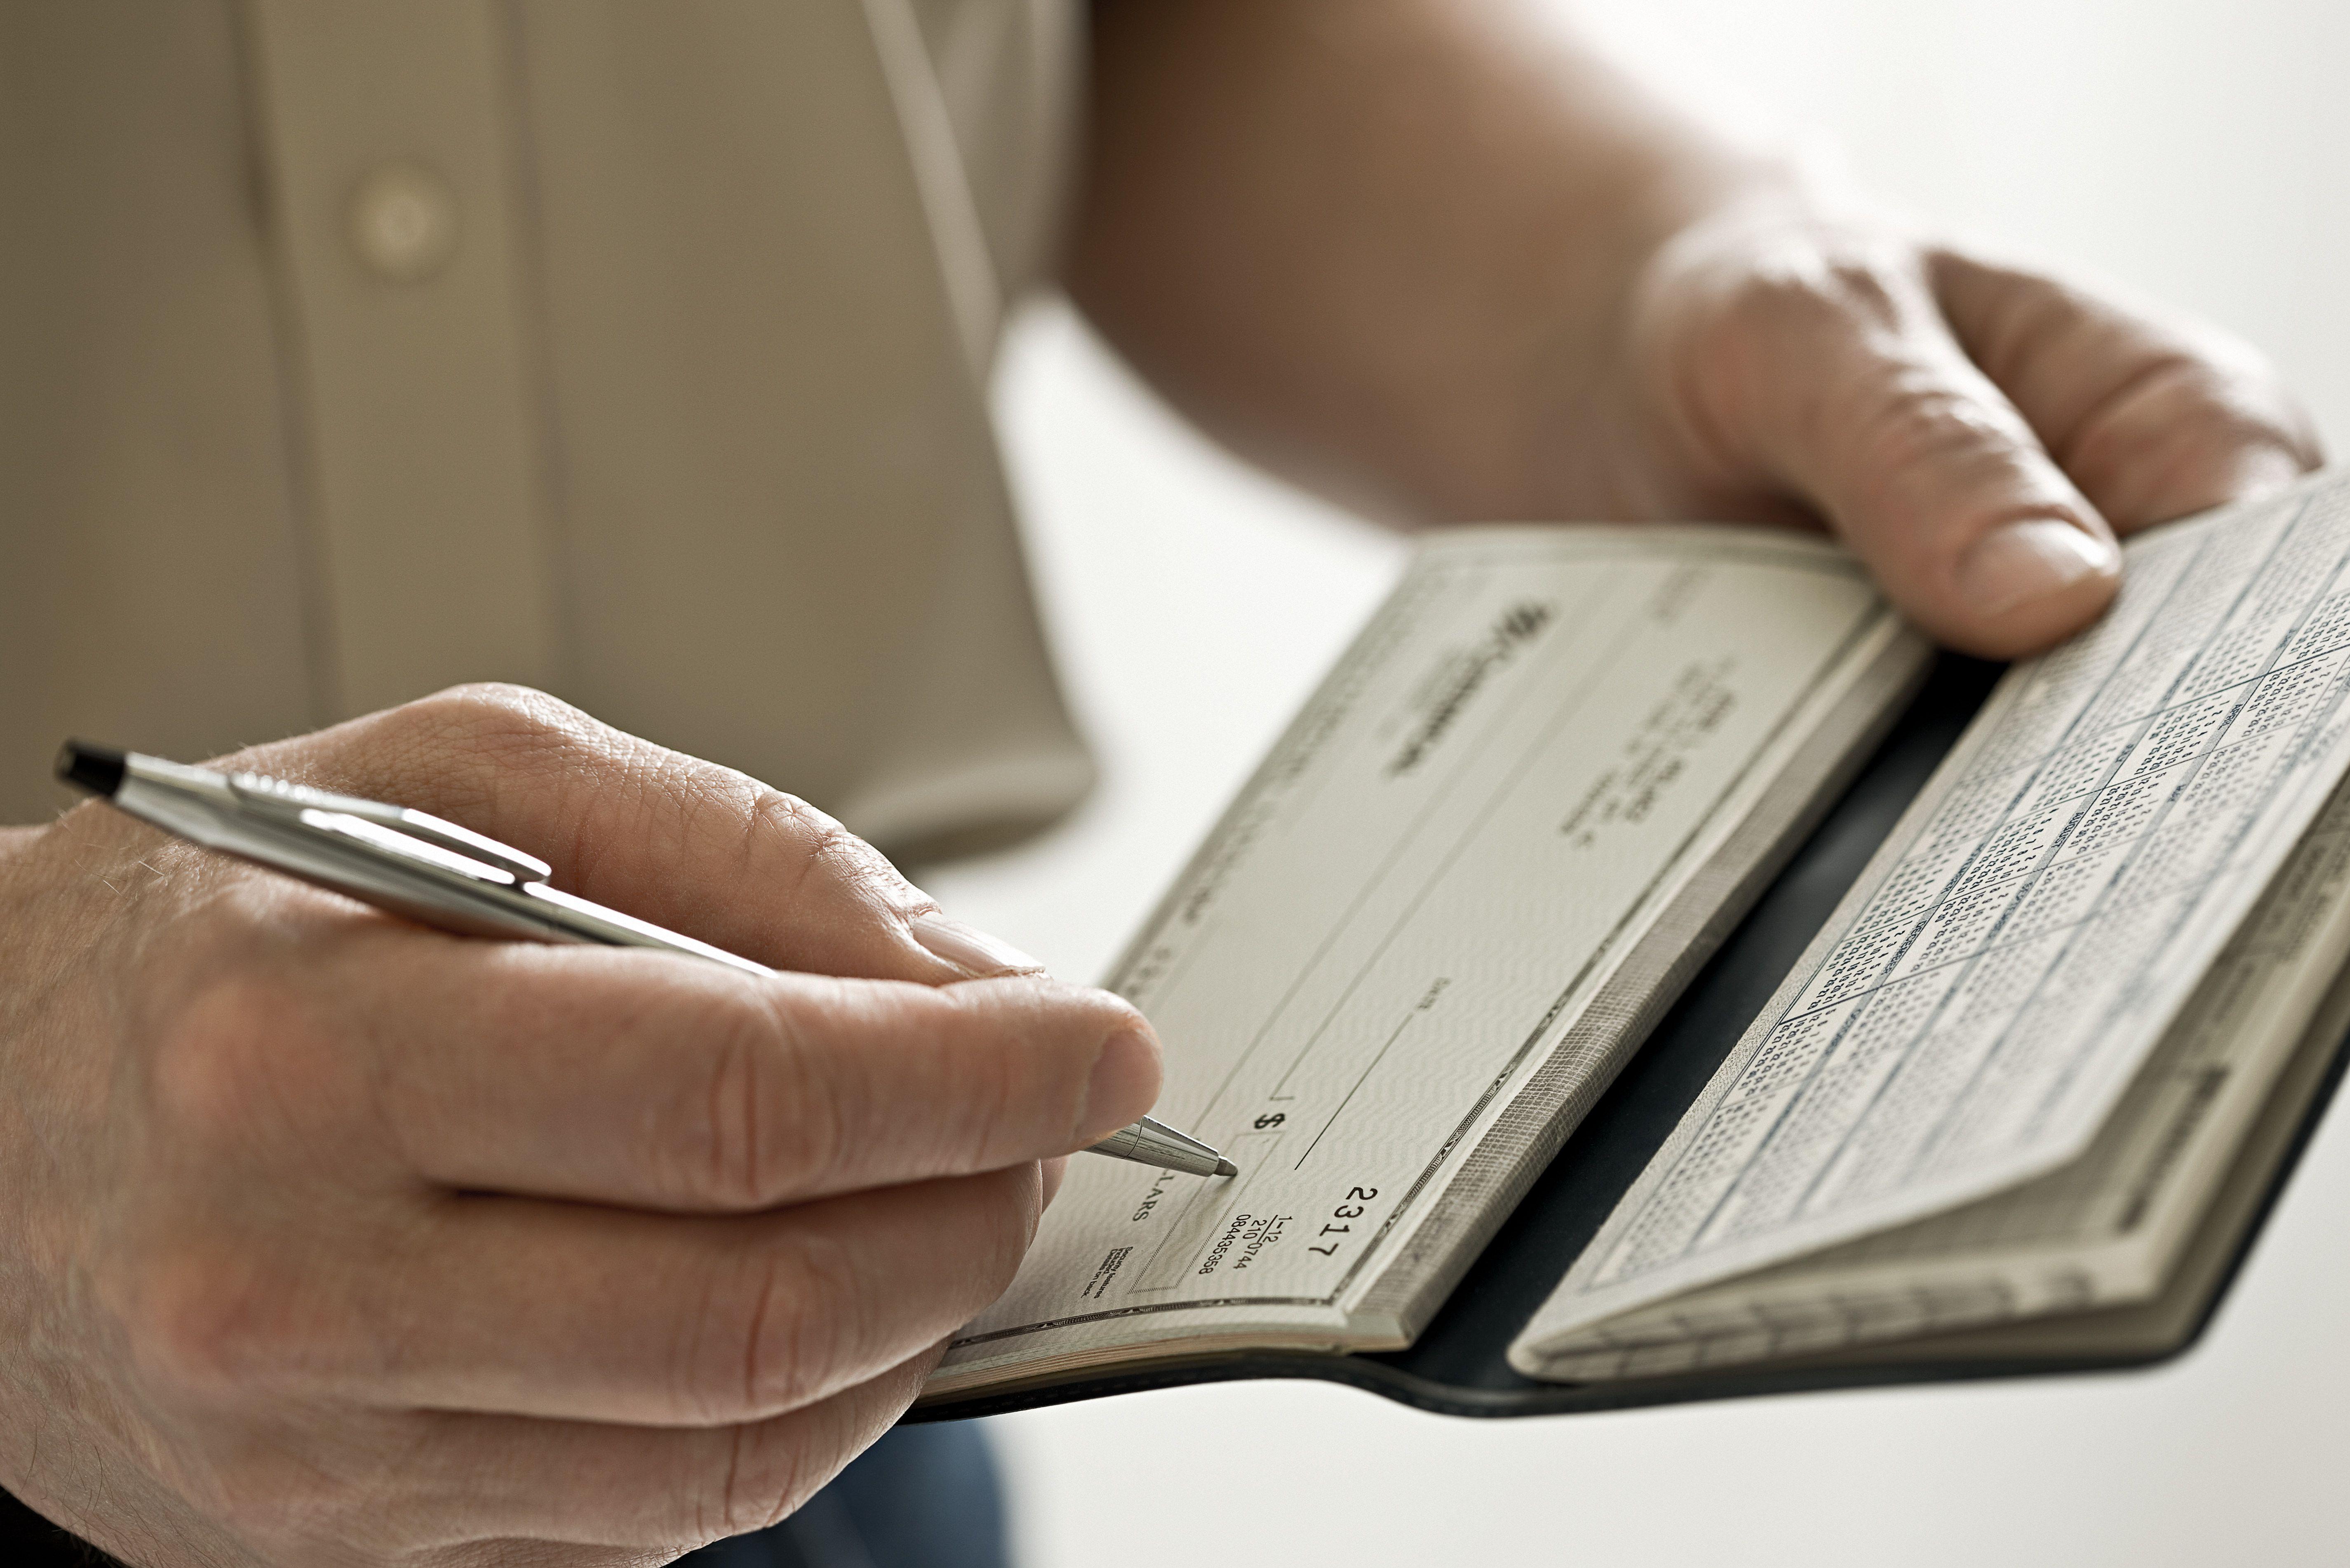 How ATM Scanning Technology Has Made Bank Deposit Envelopes Obsolete